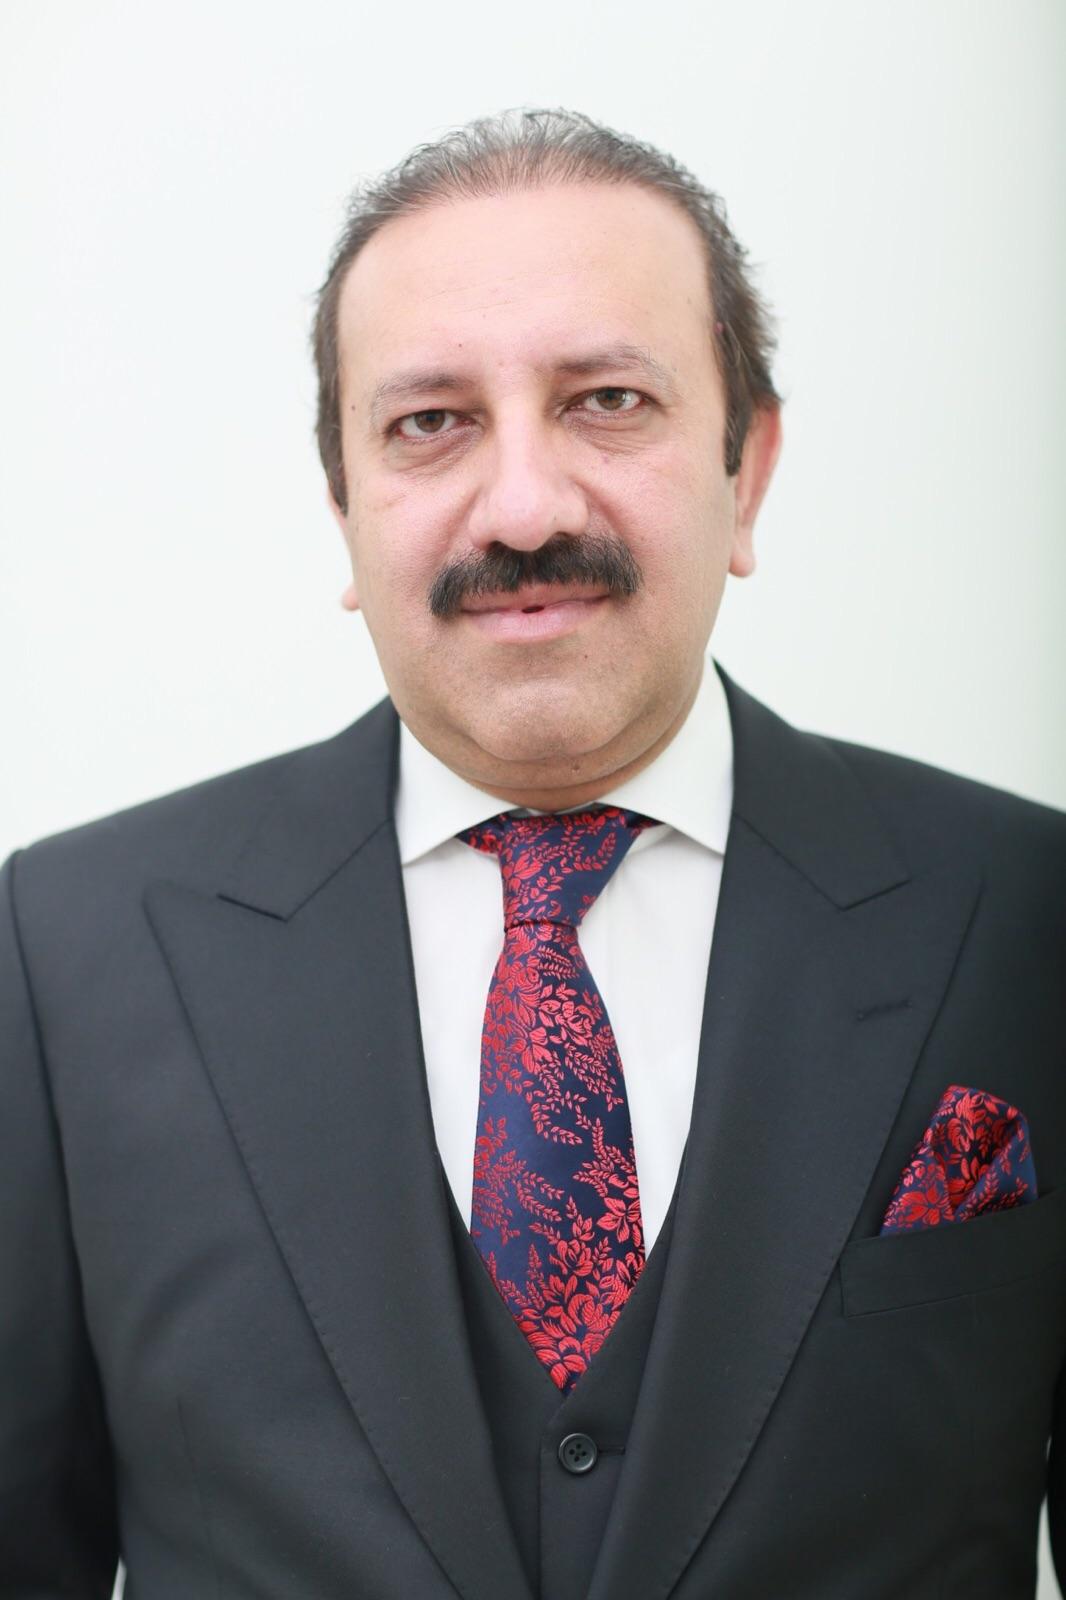 Choudhry Muhammad Shahbaz Babar